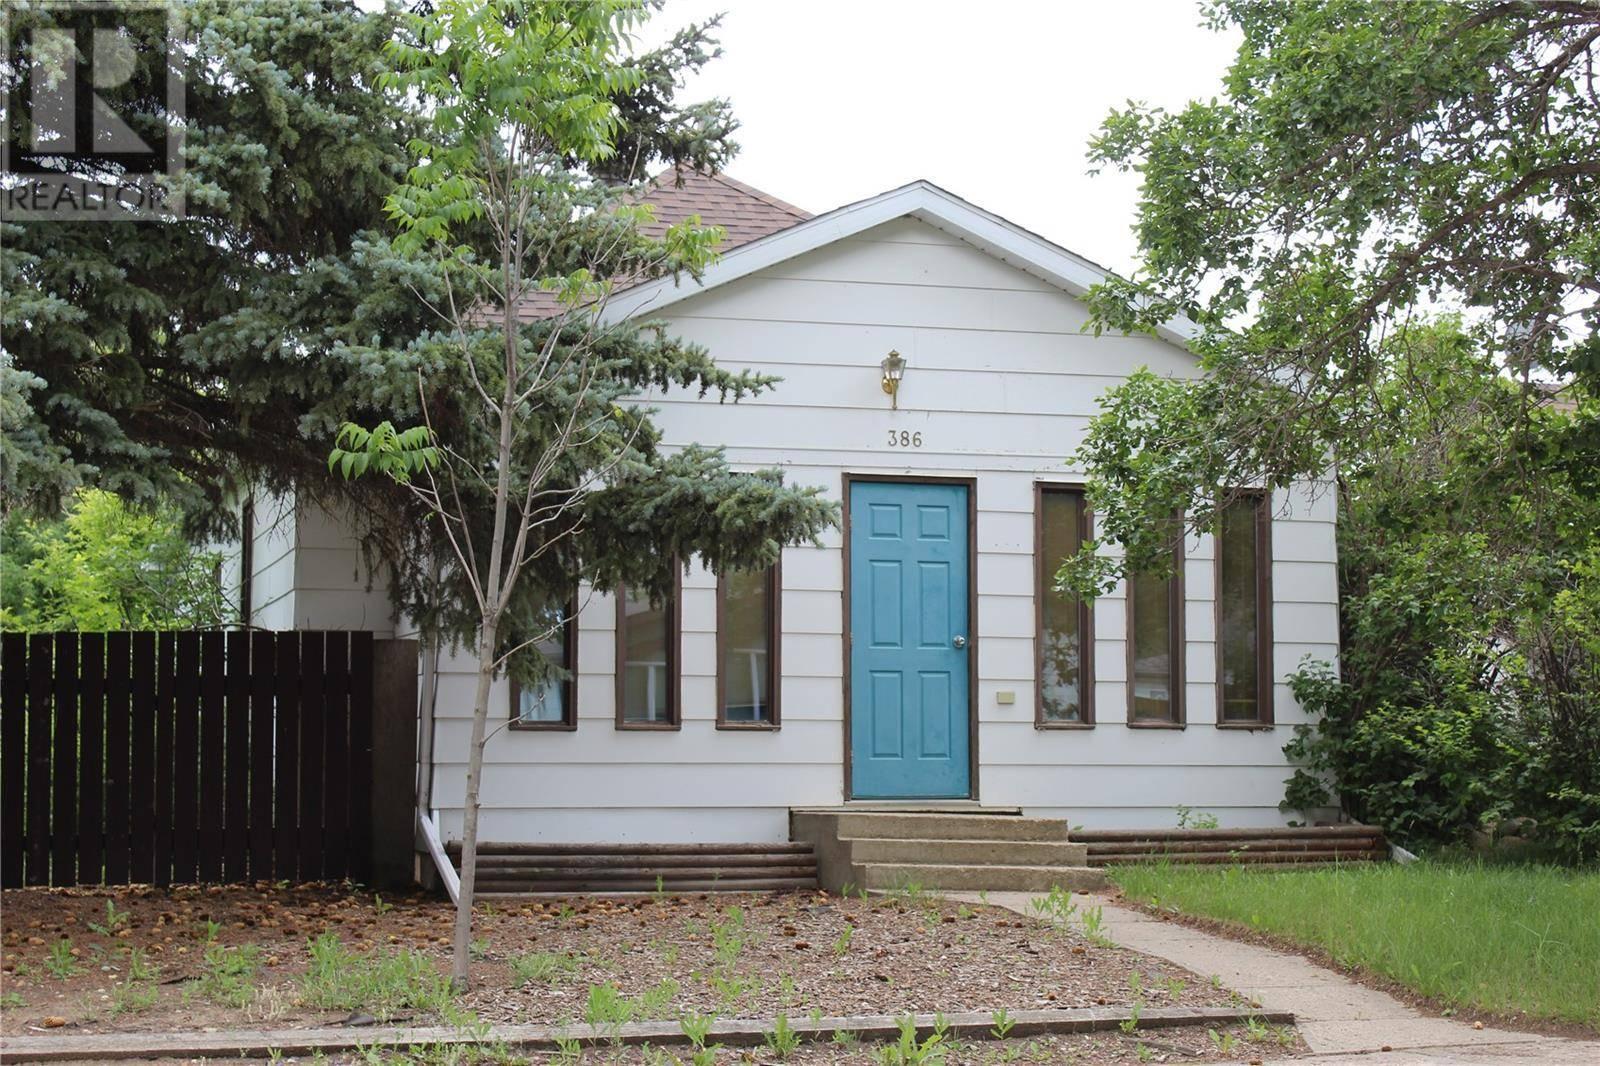 House for sale at 386 3rd St E Shaunavon Saskatchewan - MLS: SK763406